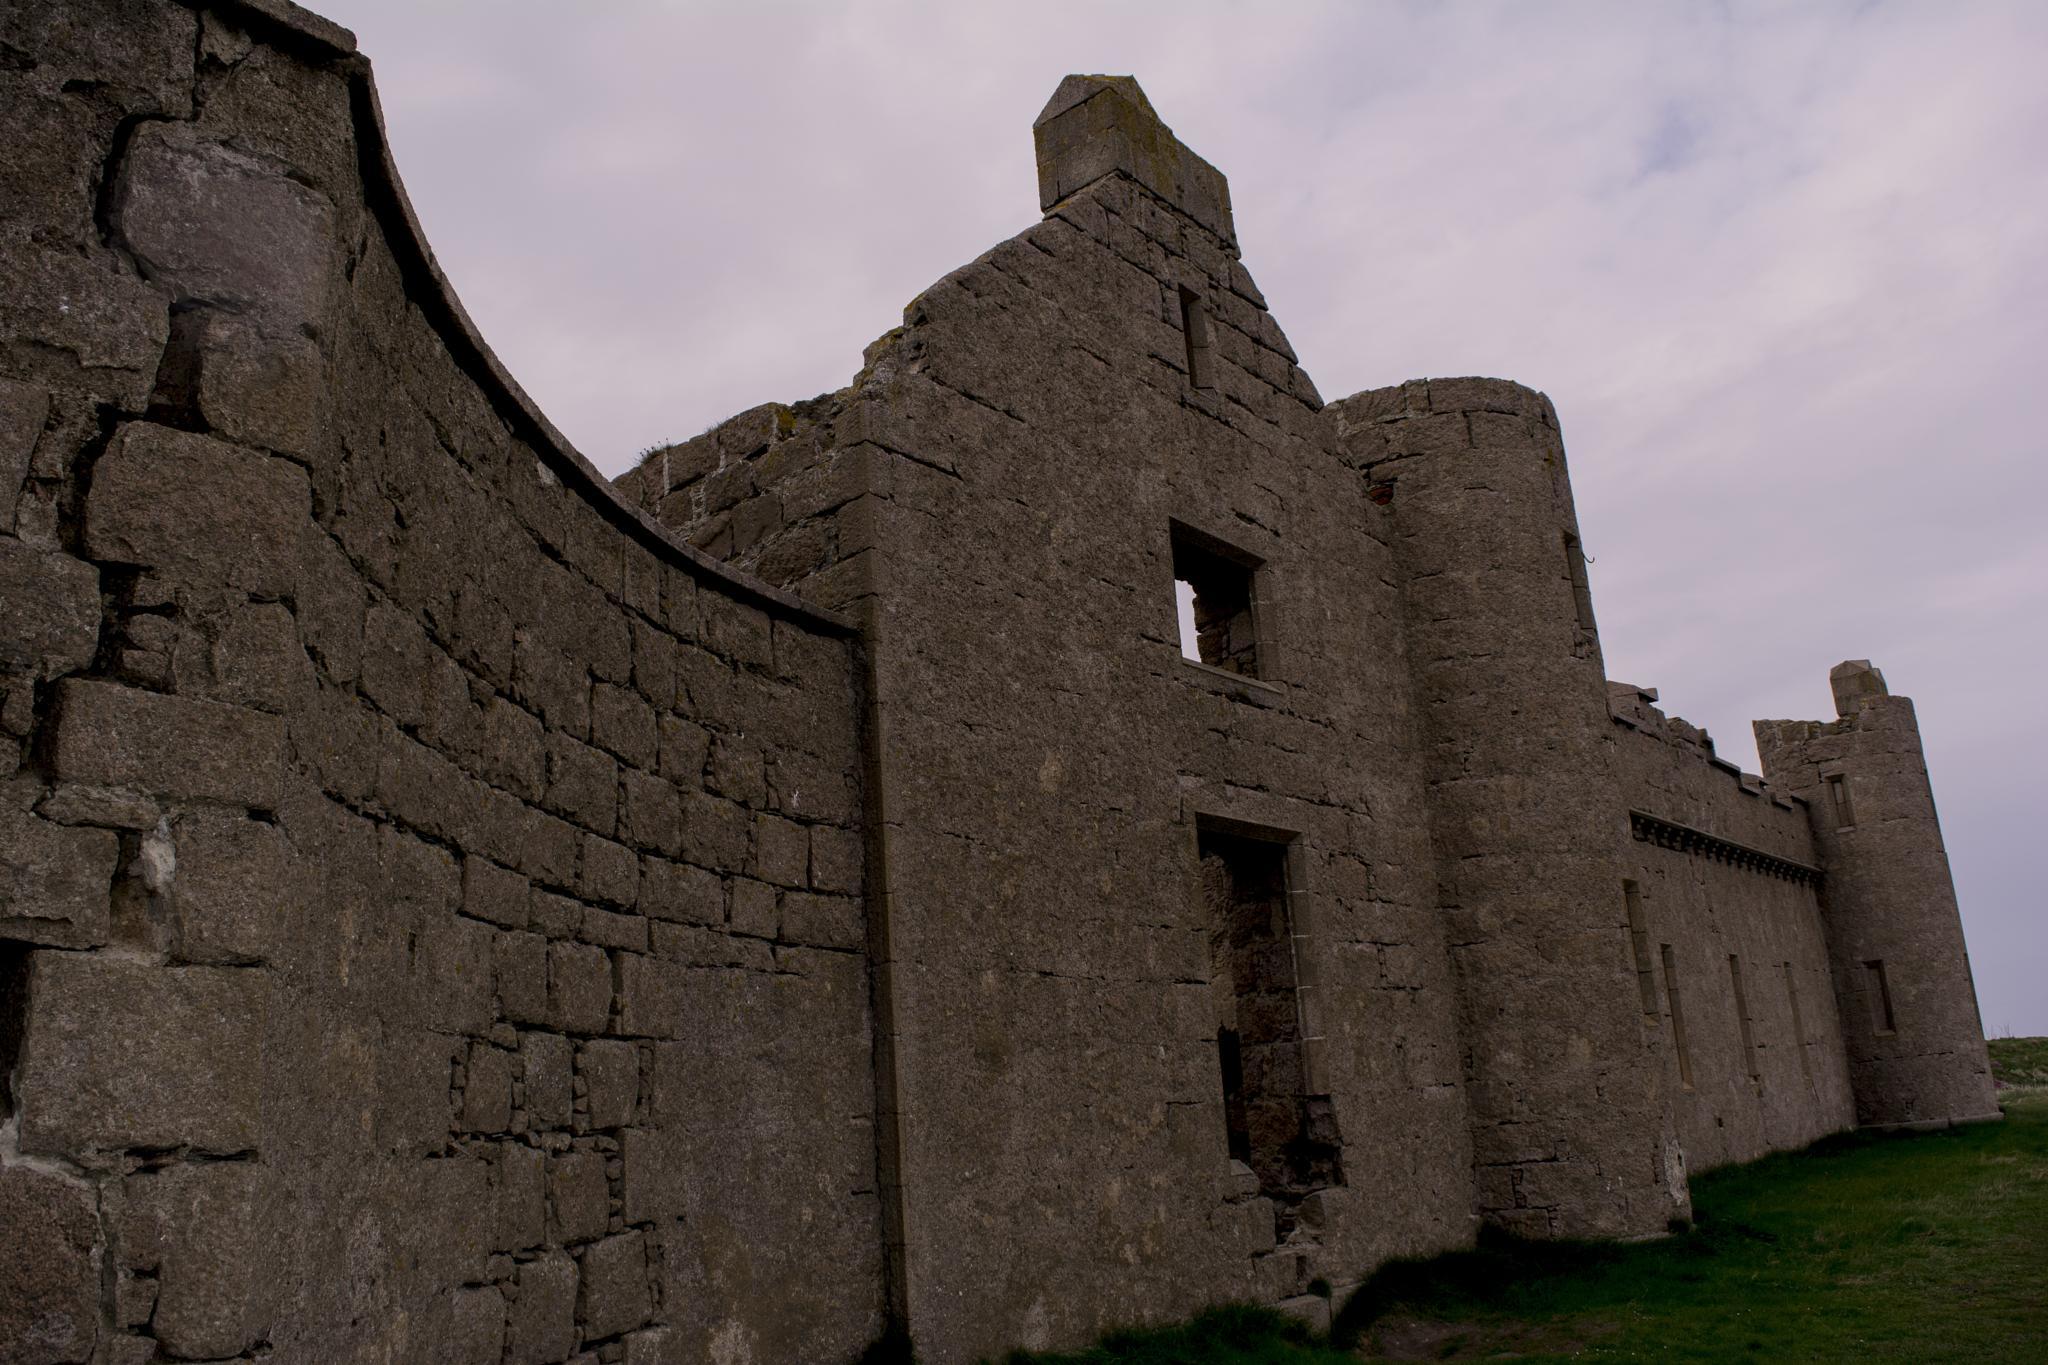 Slains Castle by ED McIntosh